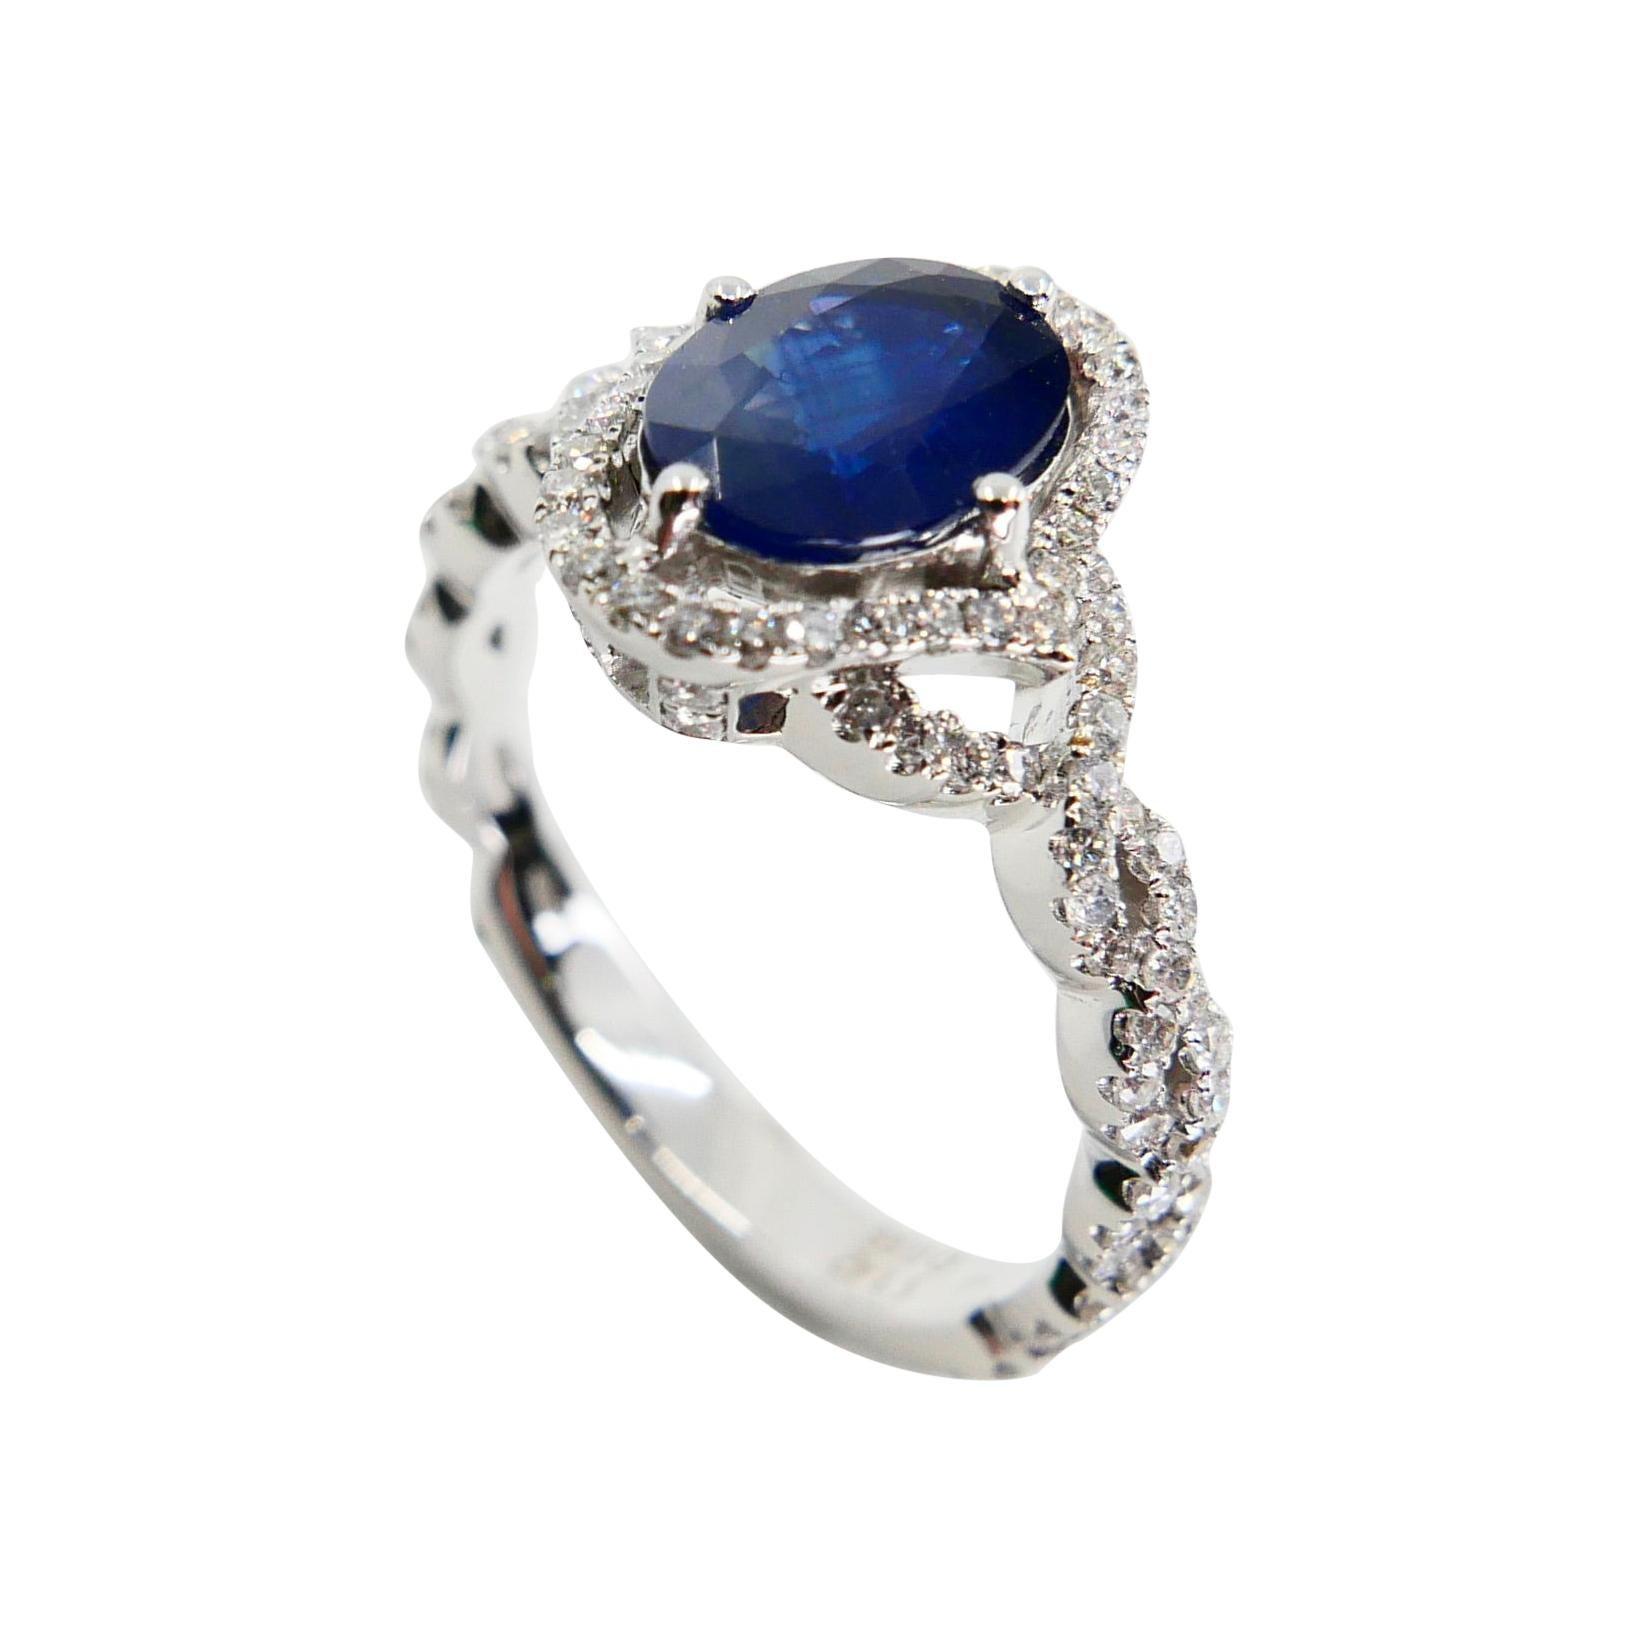 Blue Sapphire and Diamond Twist Ring, 18 Karat White Gold